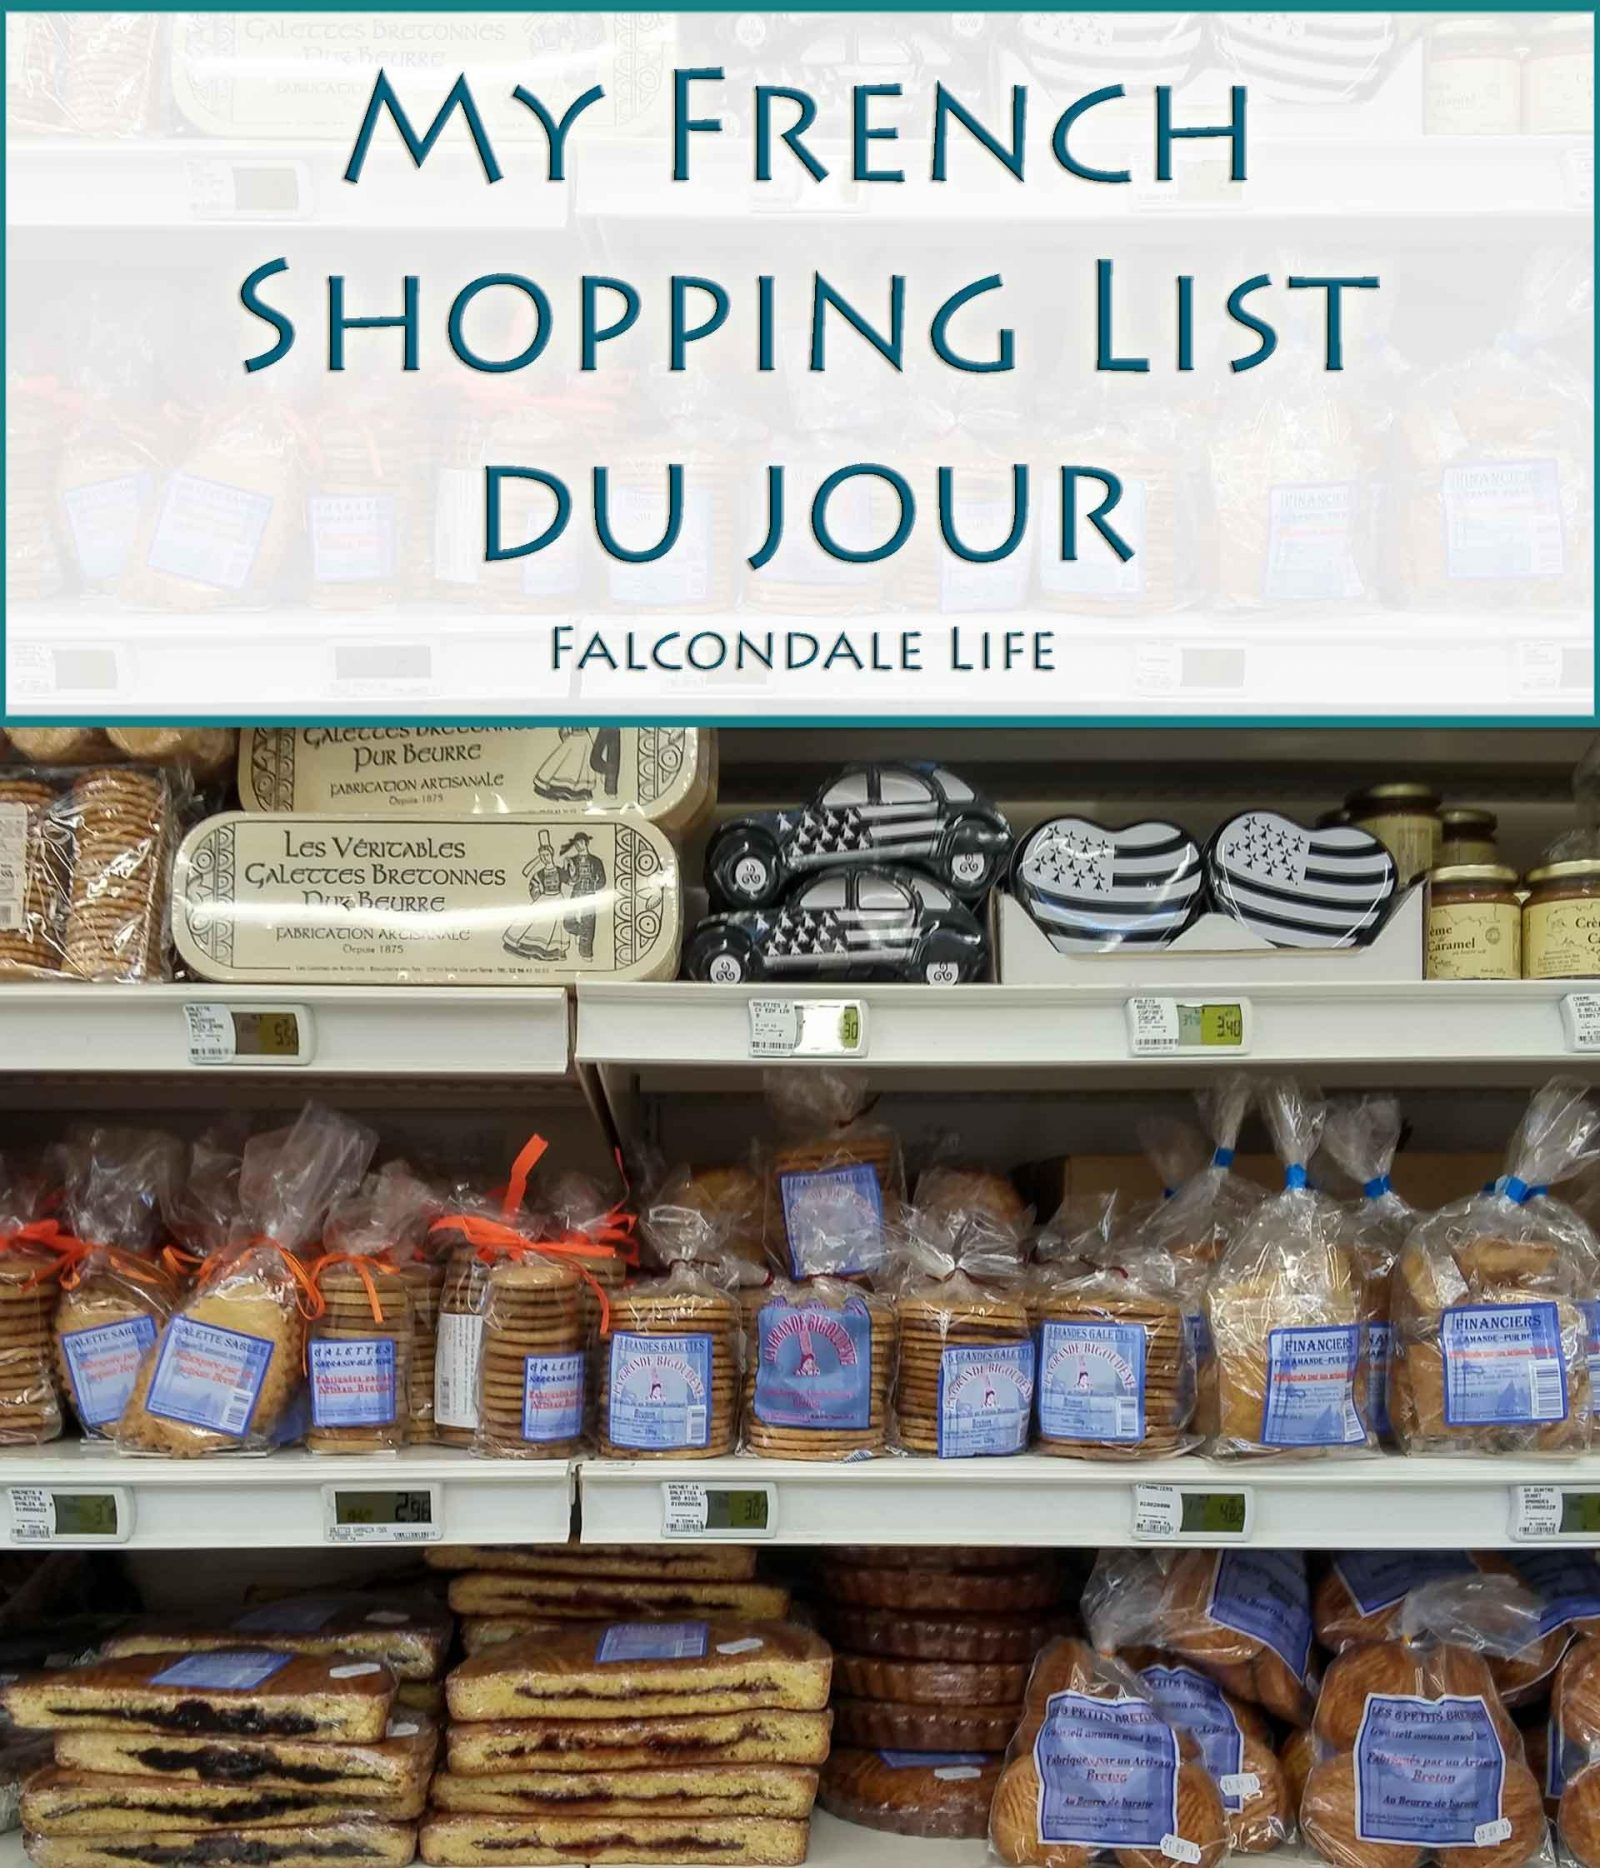 My French Shopping List du Jour on Falcondale Life blog. Supermarket shelves